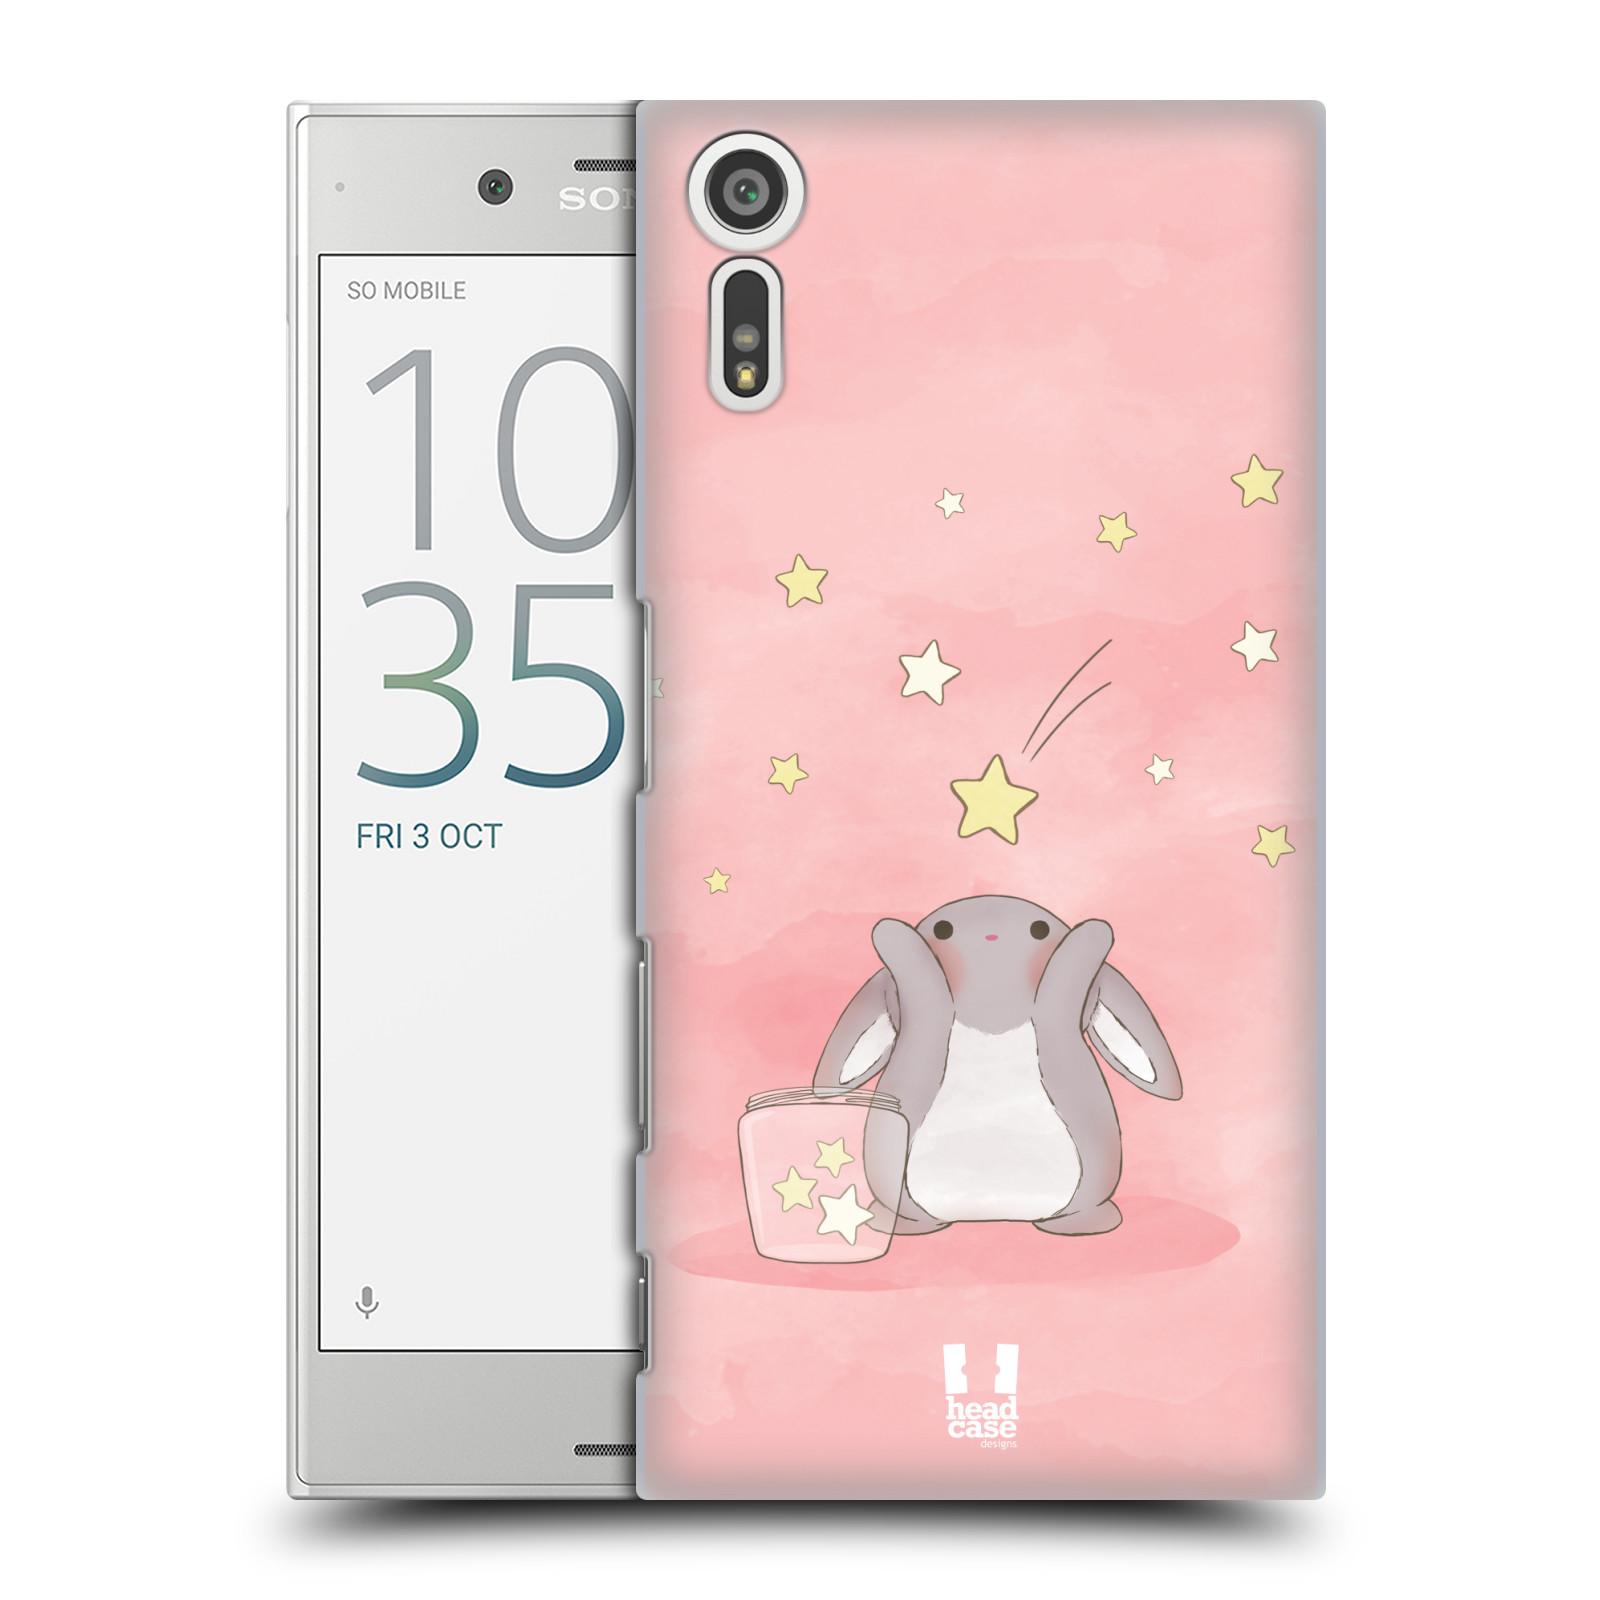 HEAD CASE plastový obal na mobil Sony Xperia XZ vzor králíček a hvězdy růžová